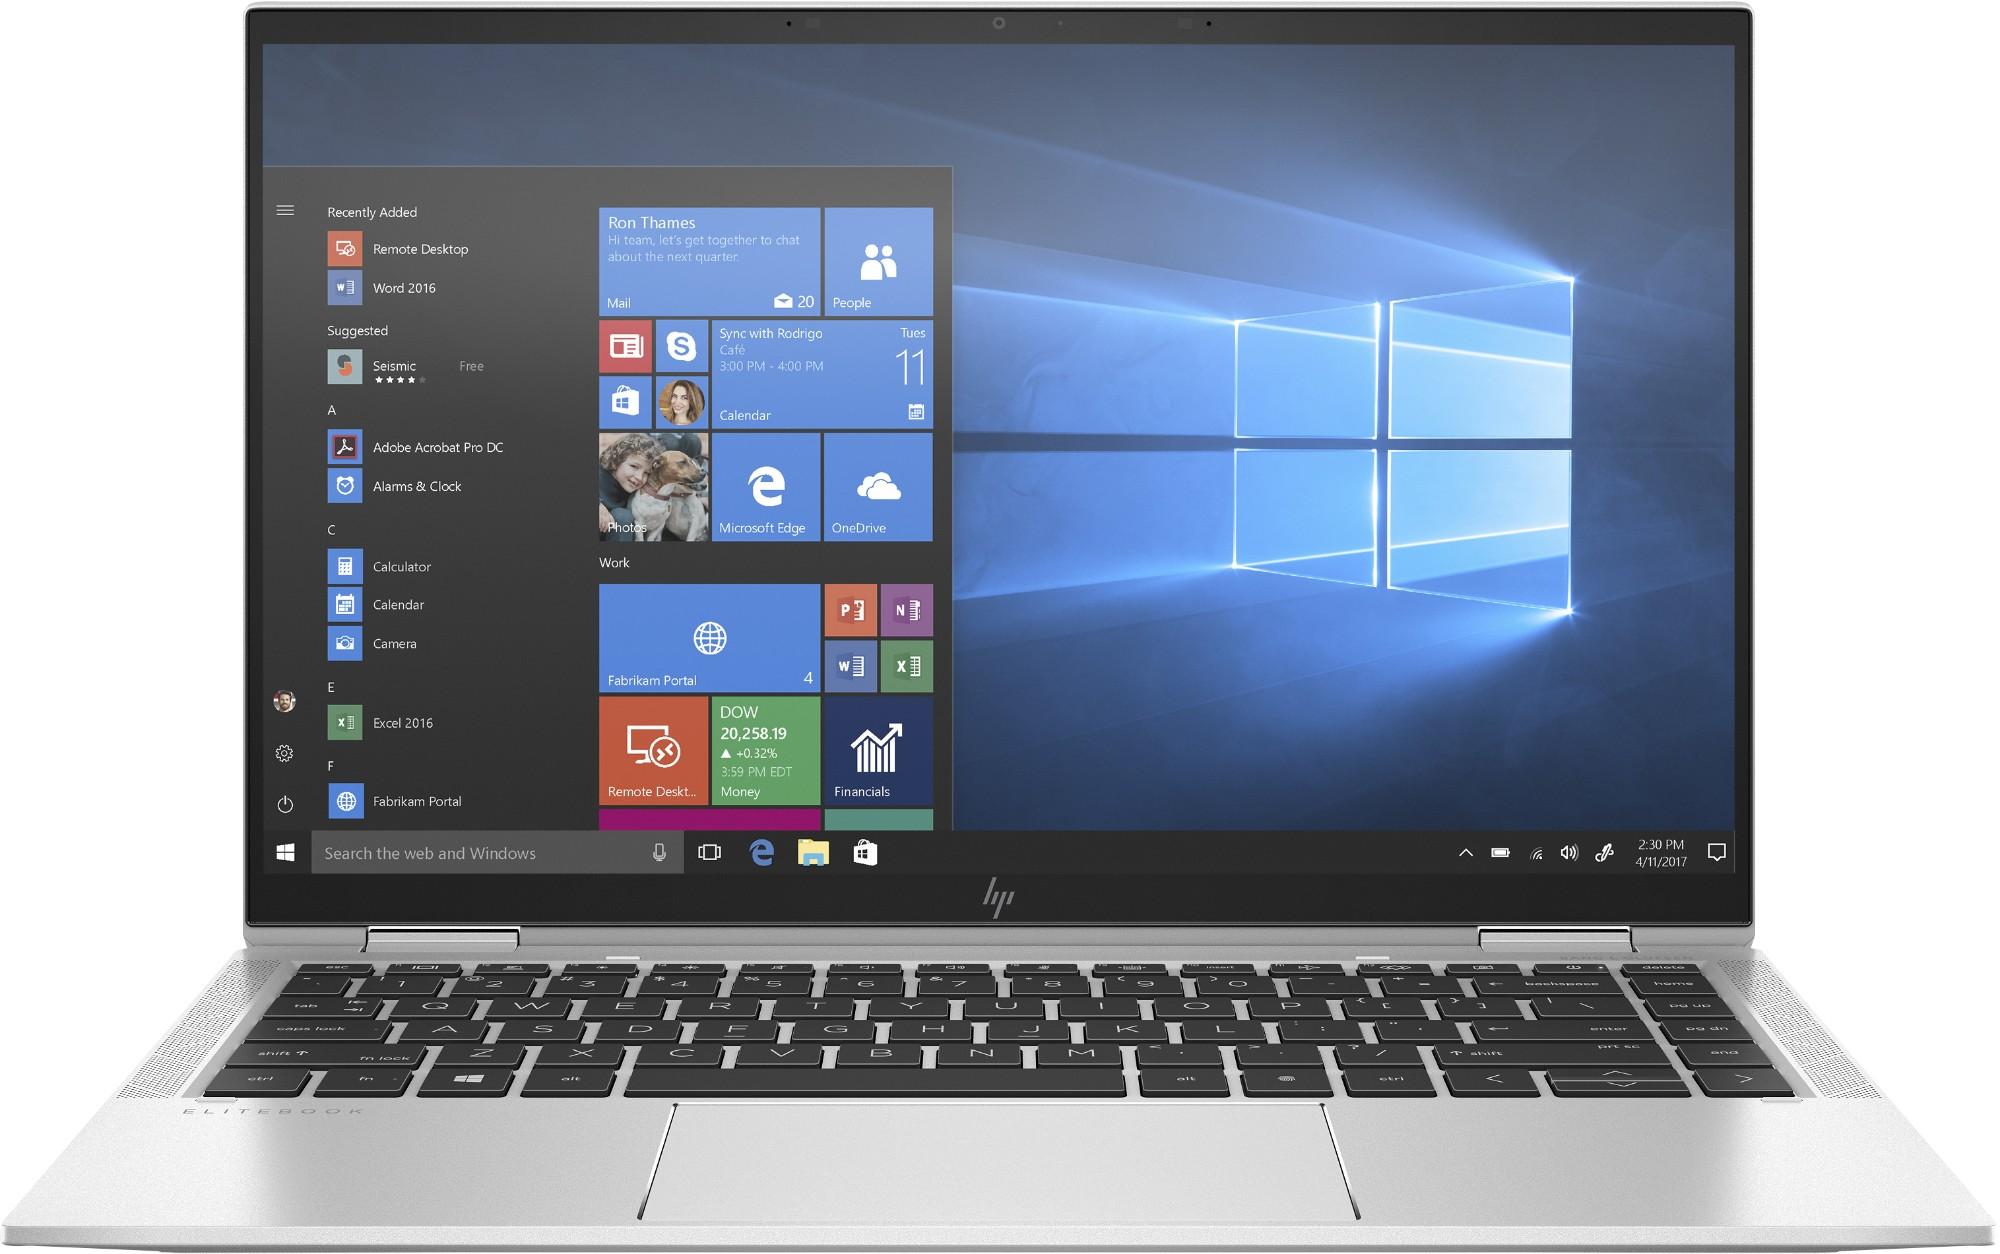 "HP EliteBook x360 1040 G7 Ultra-draagbaar Zilver 35,6 cm (14"") 1920 x 1080 Pixels Touchscreen Intel® 10de generatie Core™ i7 8 GB LPDDR4-SDRAM 256 GB SSD Wi-Fi 6 (802.11ax) Windows 10 Pro"